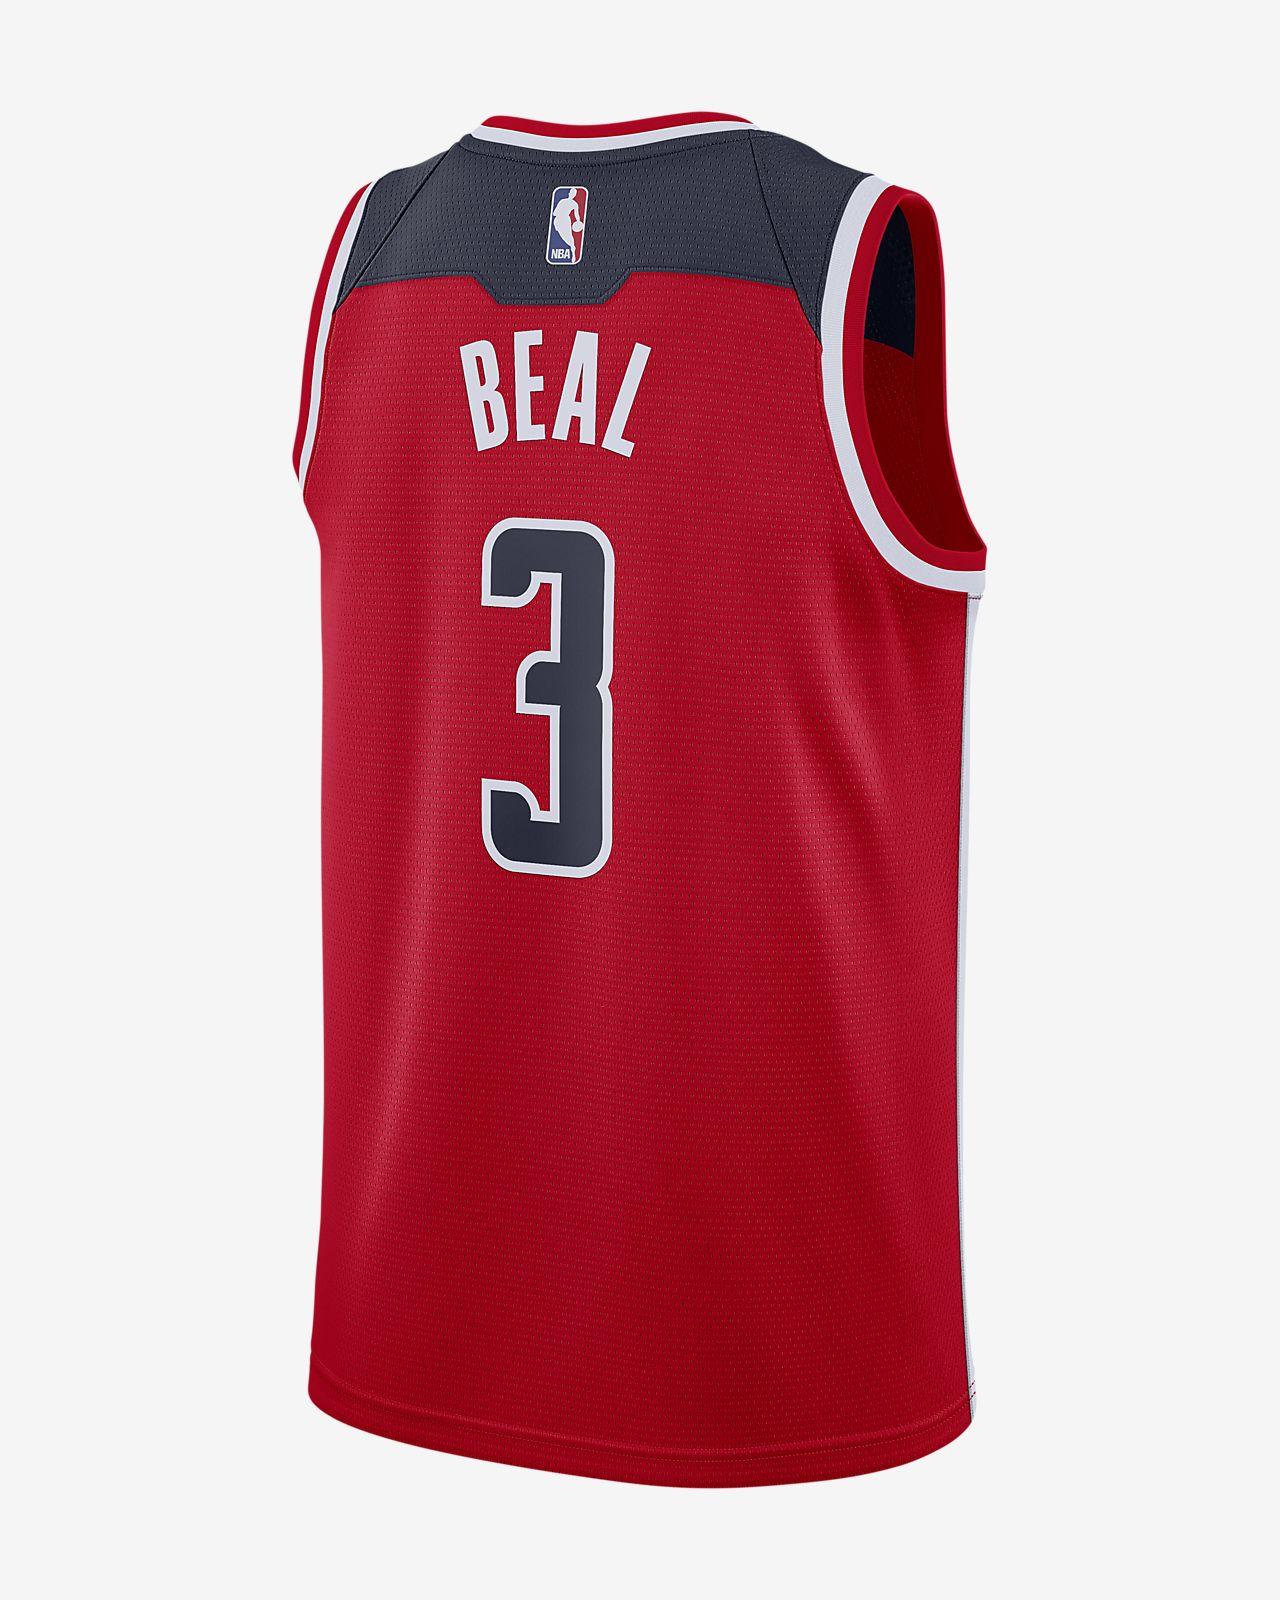 3b9345b43af ... Bradley Beal Icon Edition Swingman (Washington Wizards) Men's Nike NBA  Connected Jersey